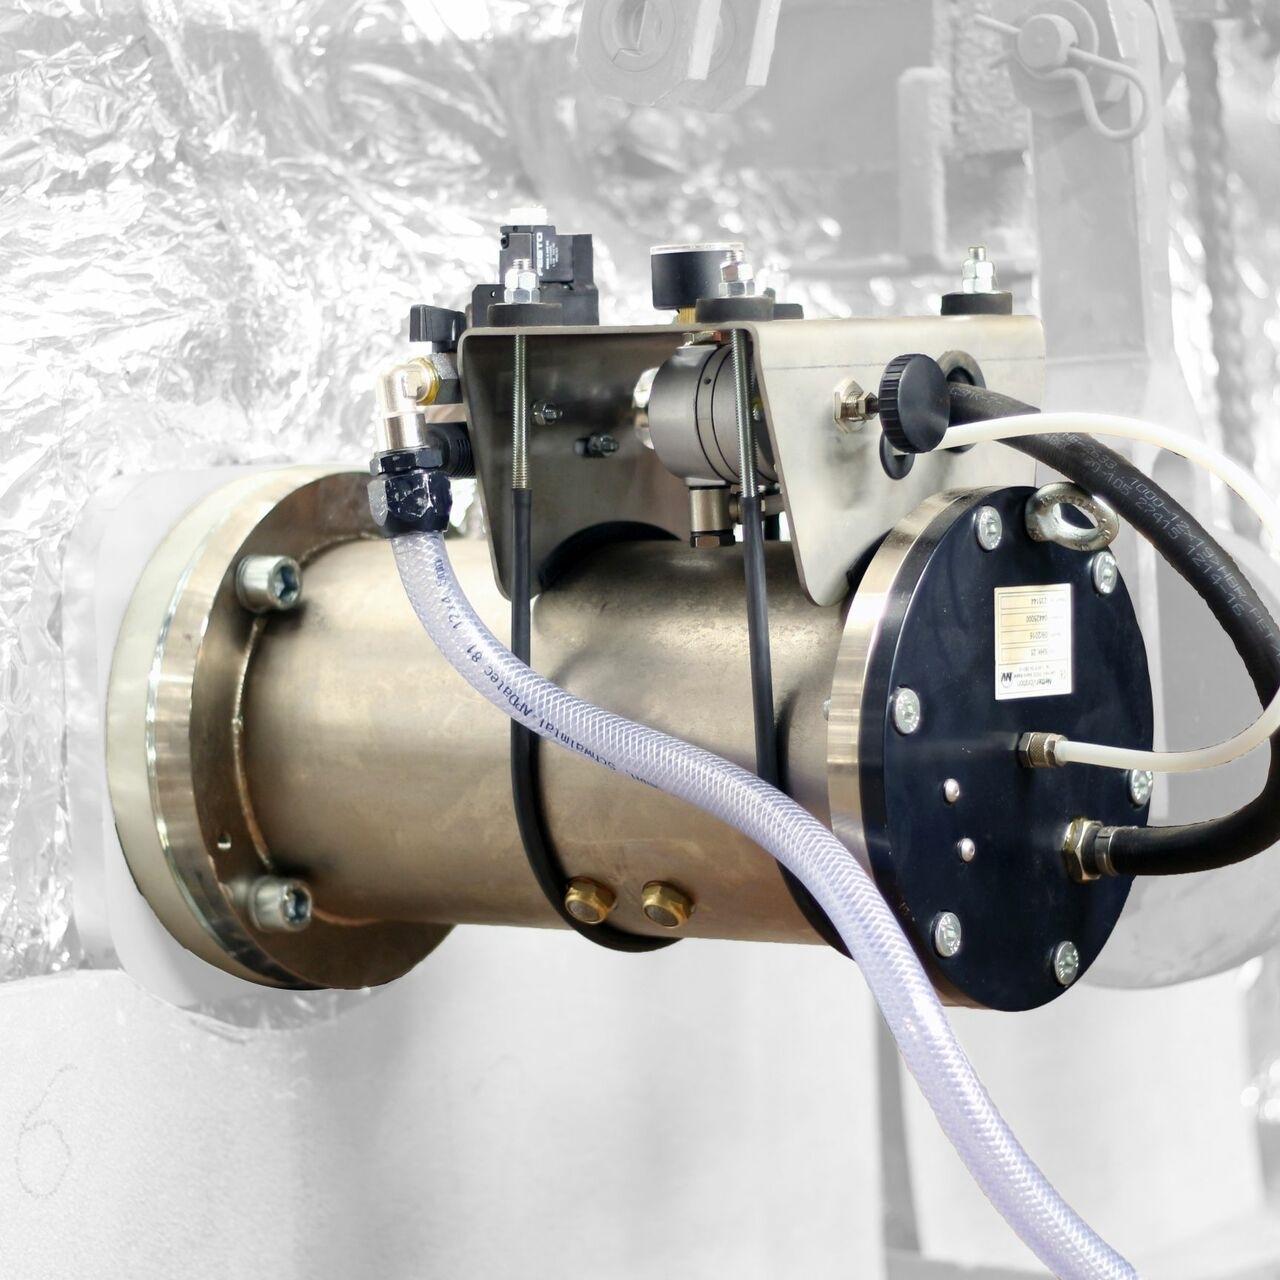 Netter Vibration振动器在清洁行业的应用